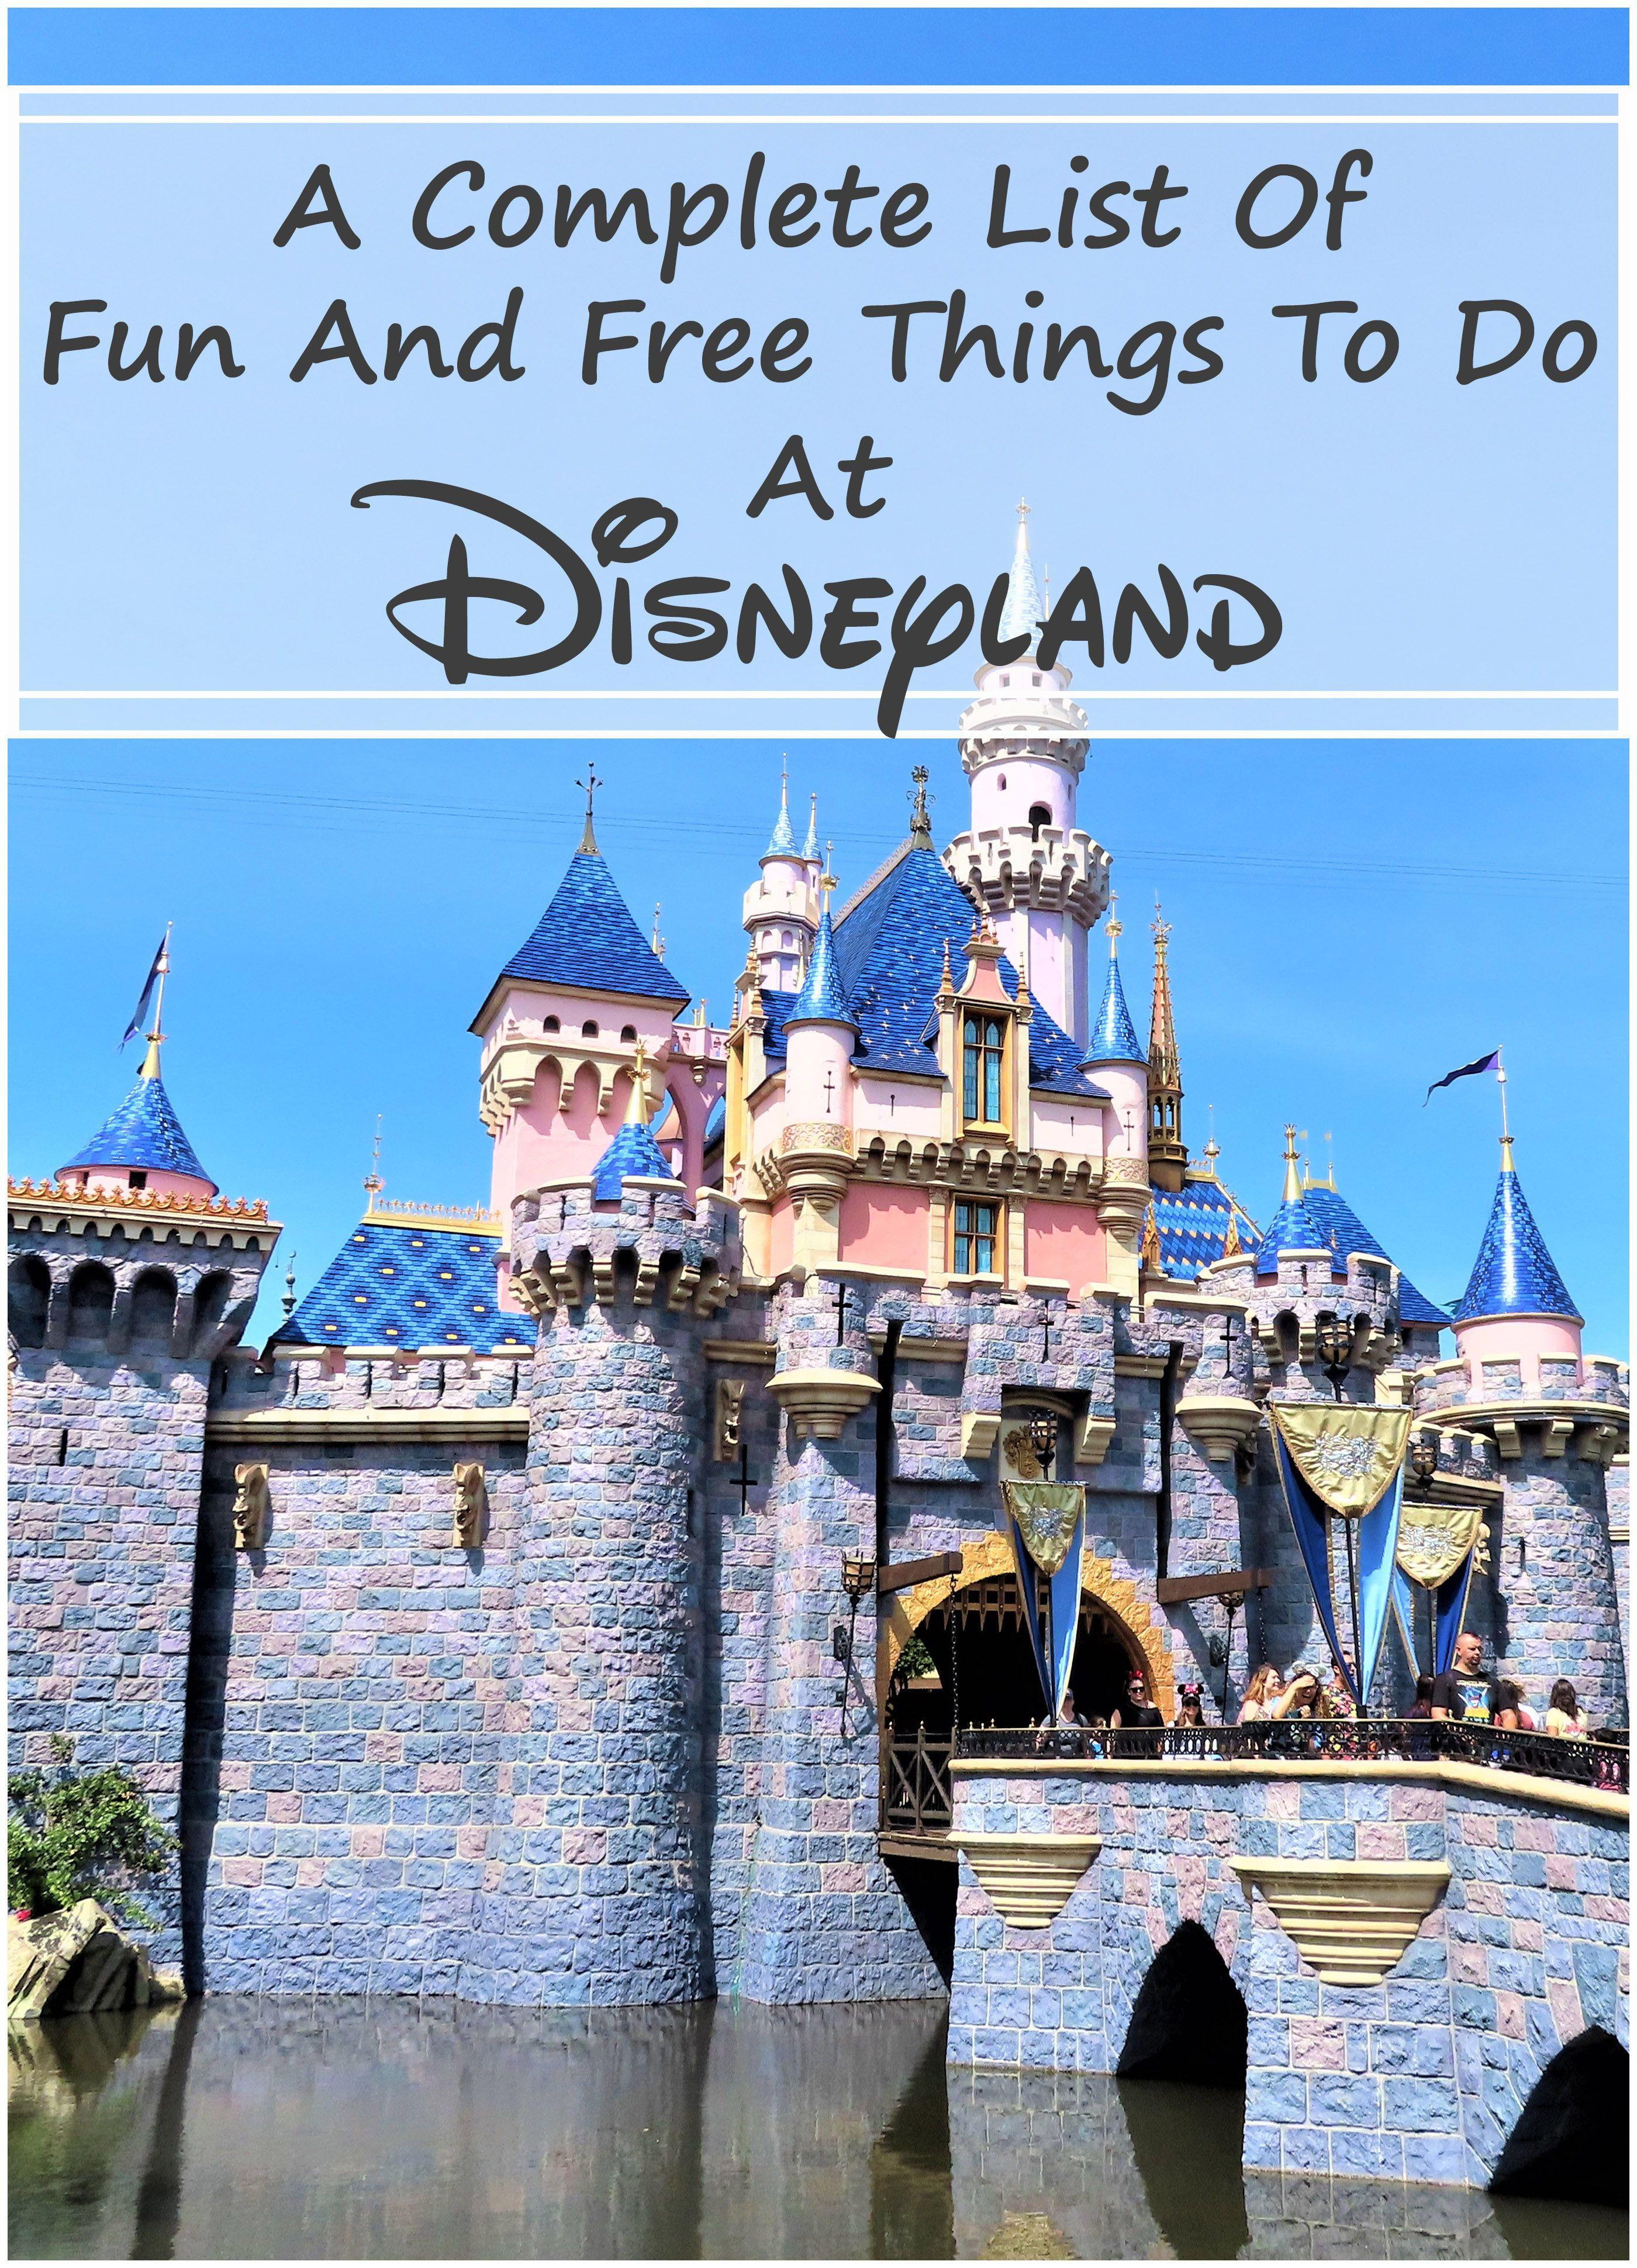 Free Stuff At Disneyland Theme Parks In 2020 Disneyland Planning Disneyland Vacation Disneyland California Adventure